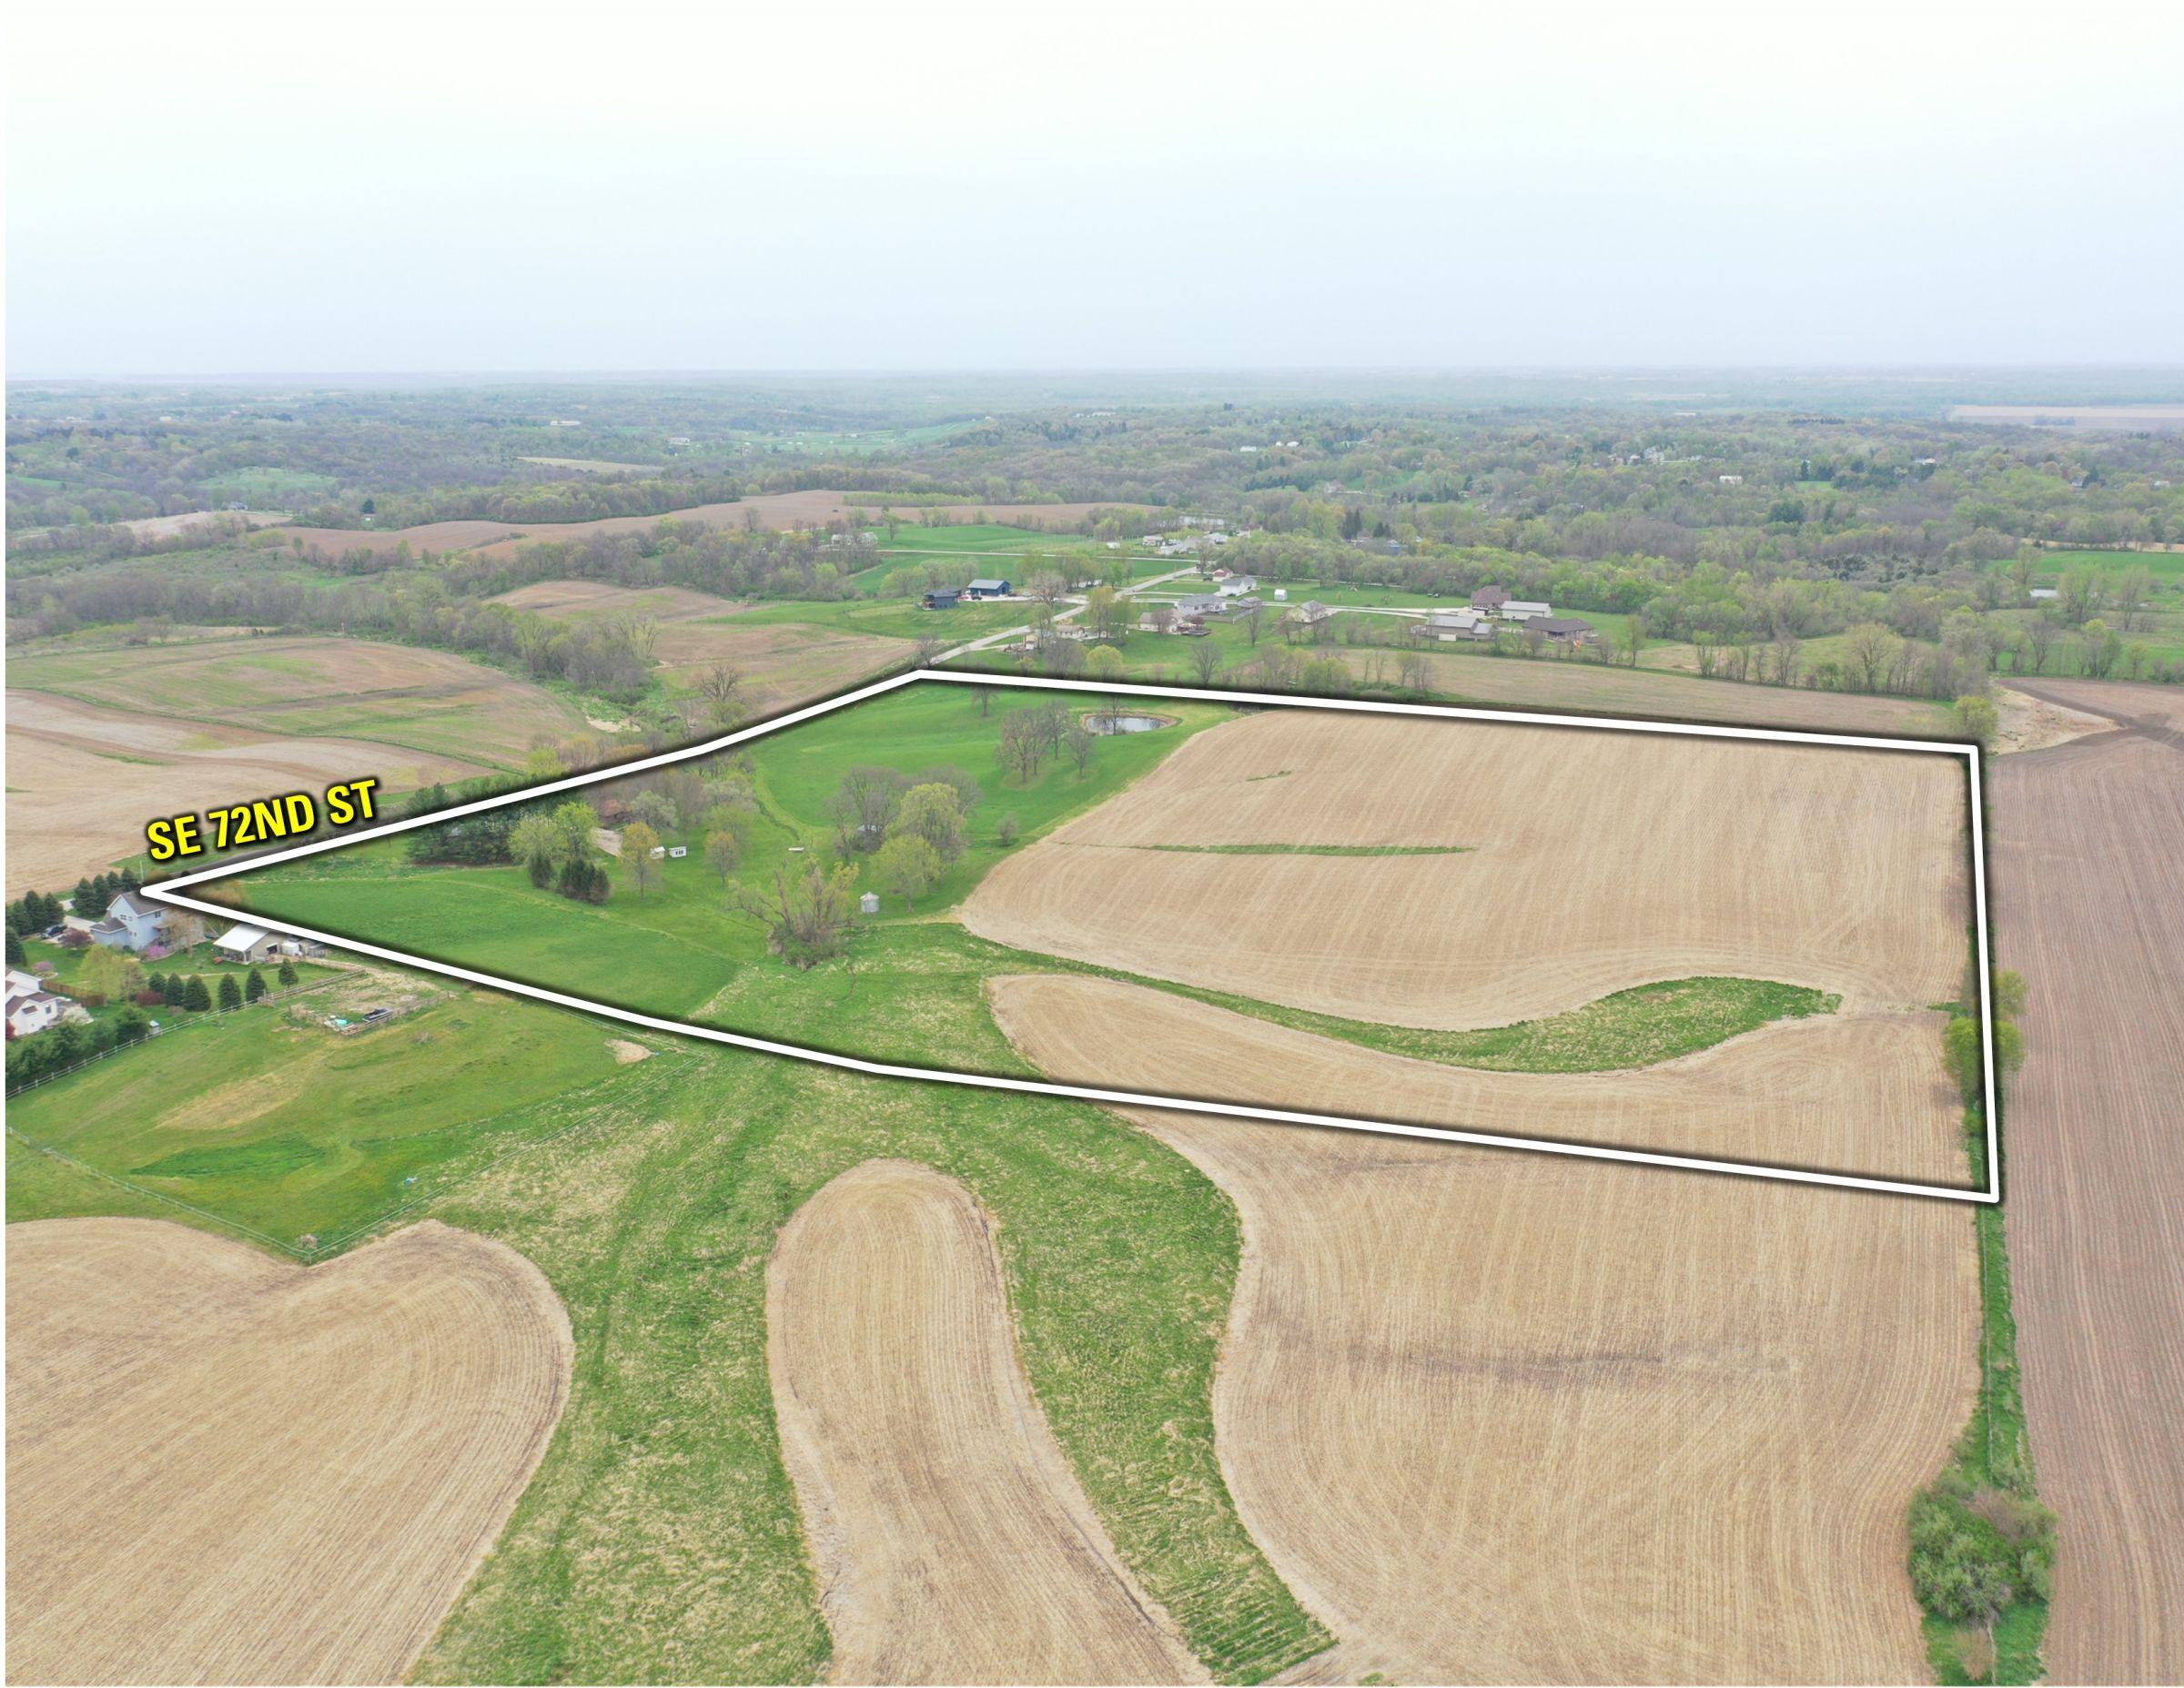 residential-polk-county-iowa-34-acres-listing-number-15502-1-2021-04-29-142858.jpg